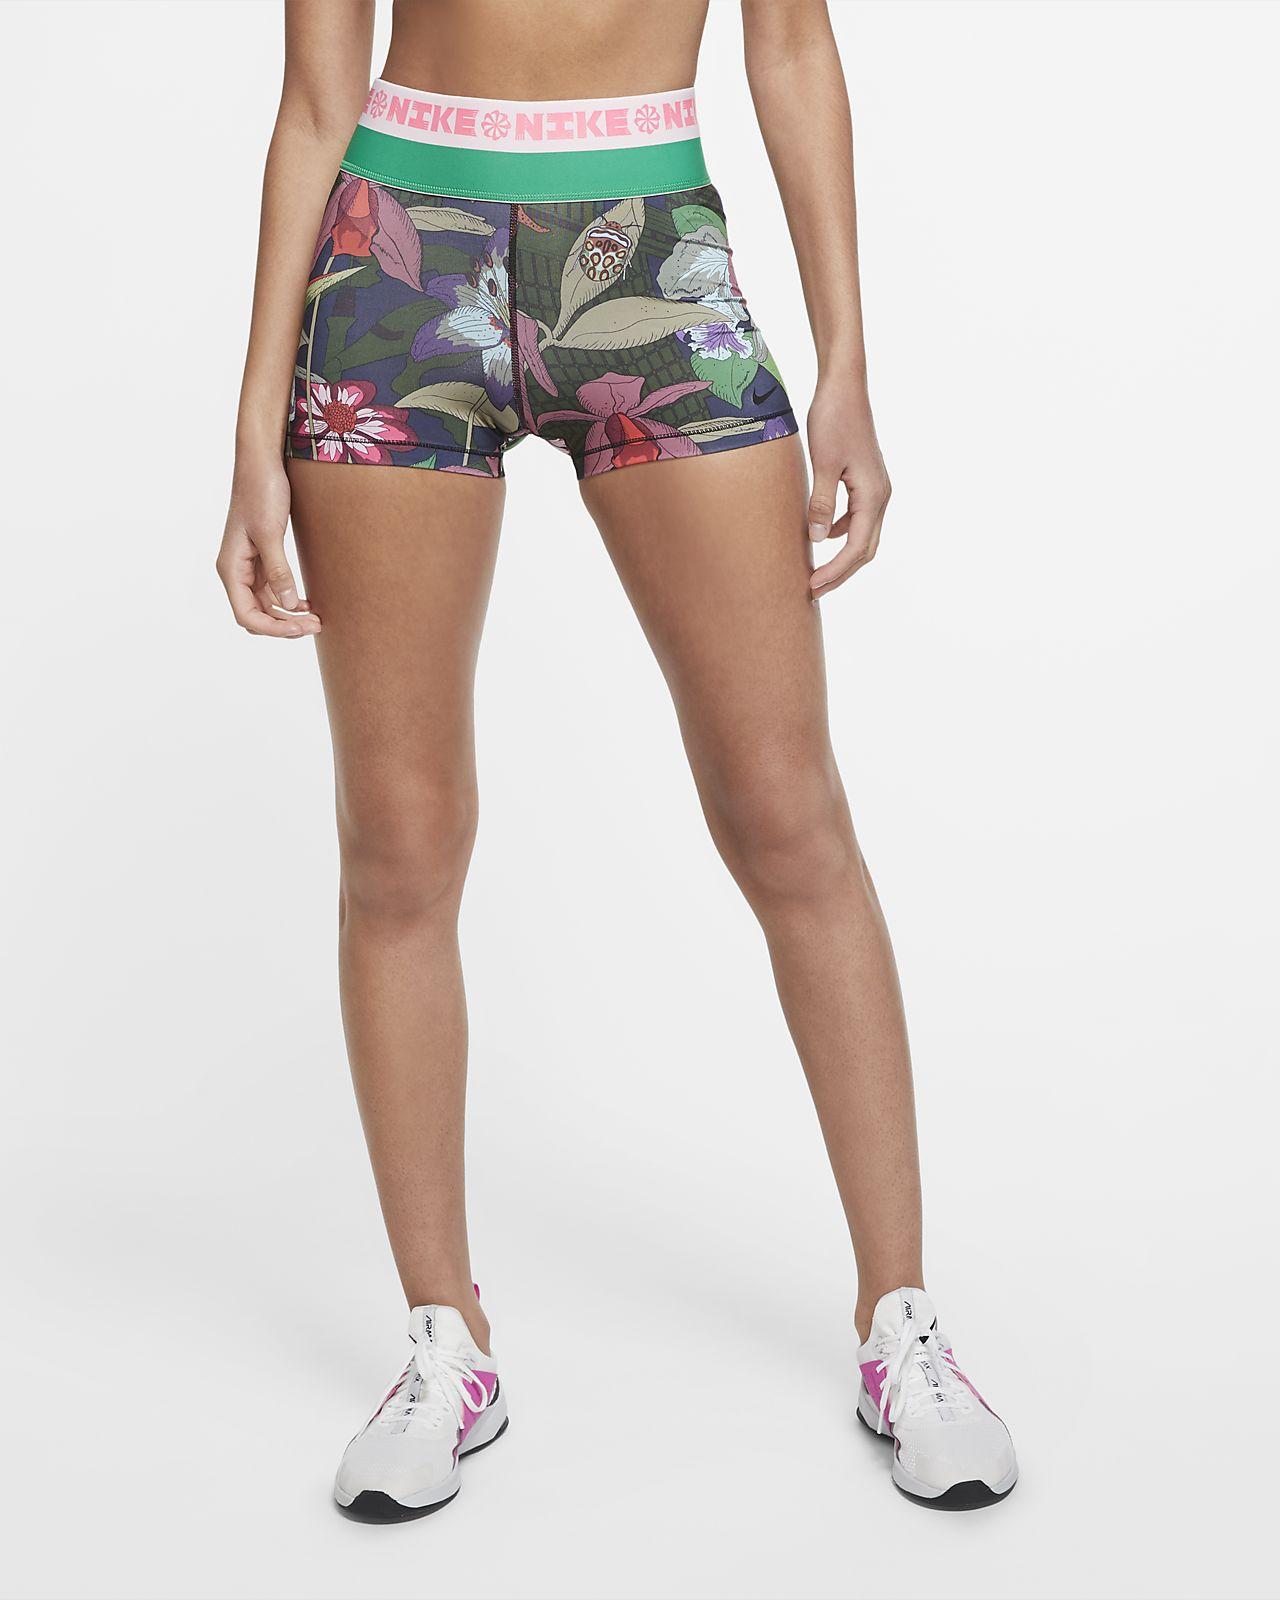 Nike Icon Clash Women's 8cm (approx.) Printed Training Shorts